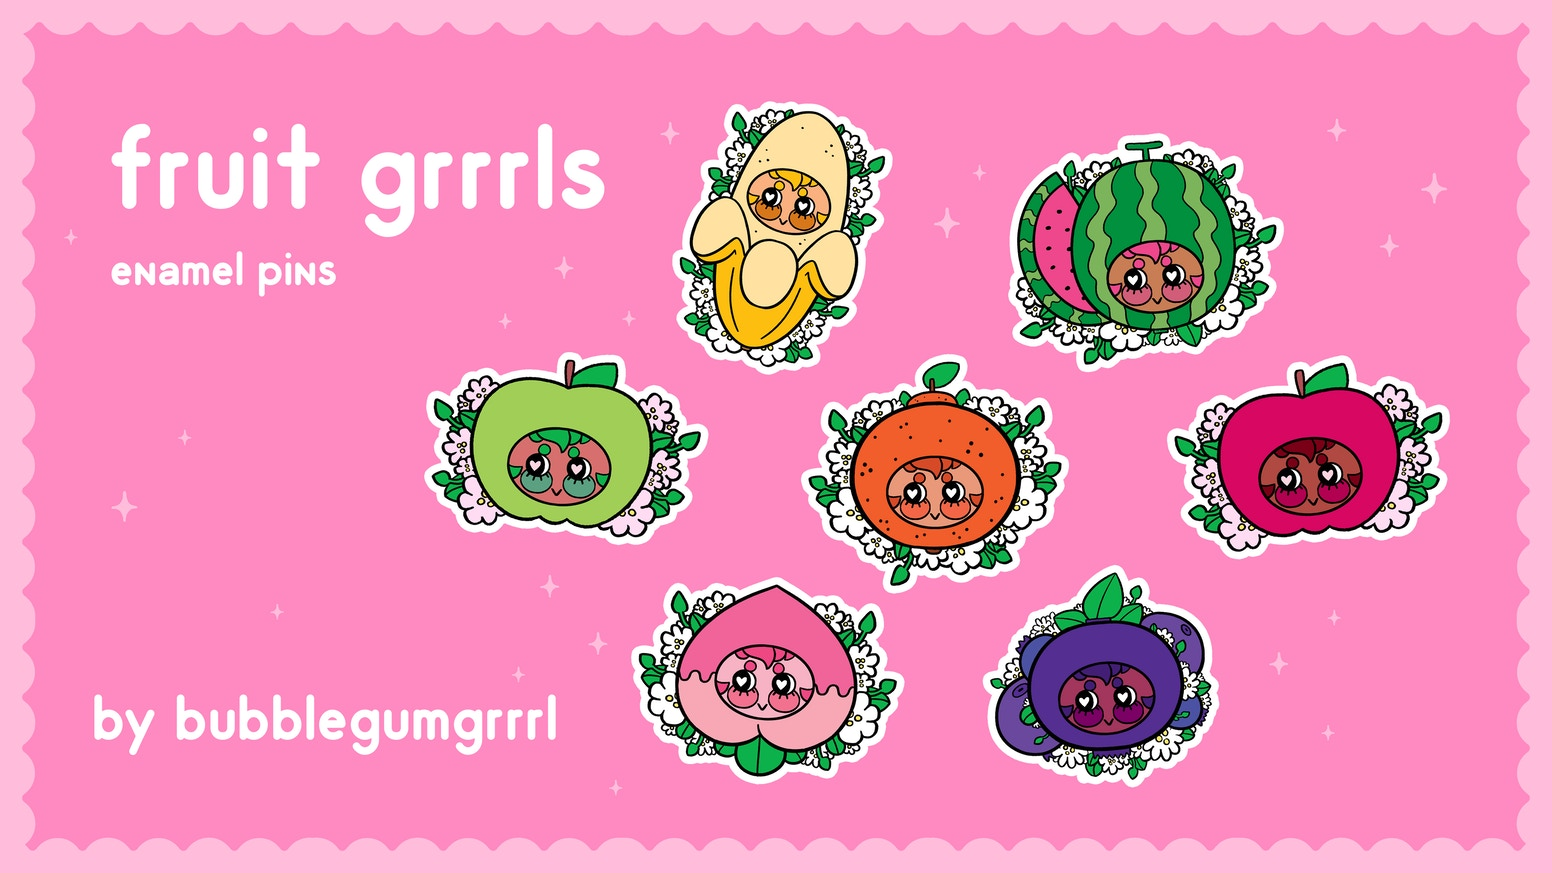 An enamel pin collection of cutesy fruit grrrls!